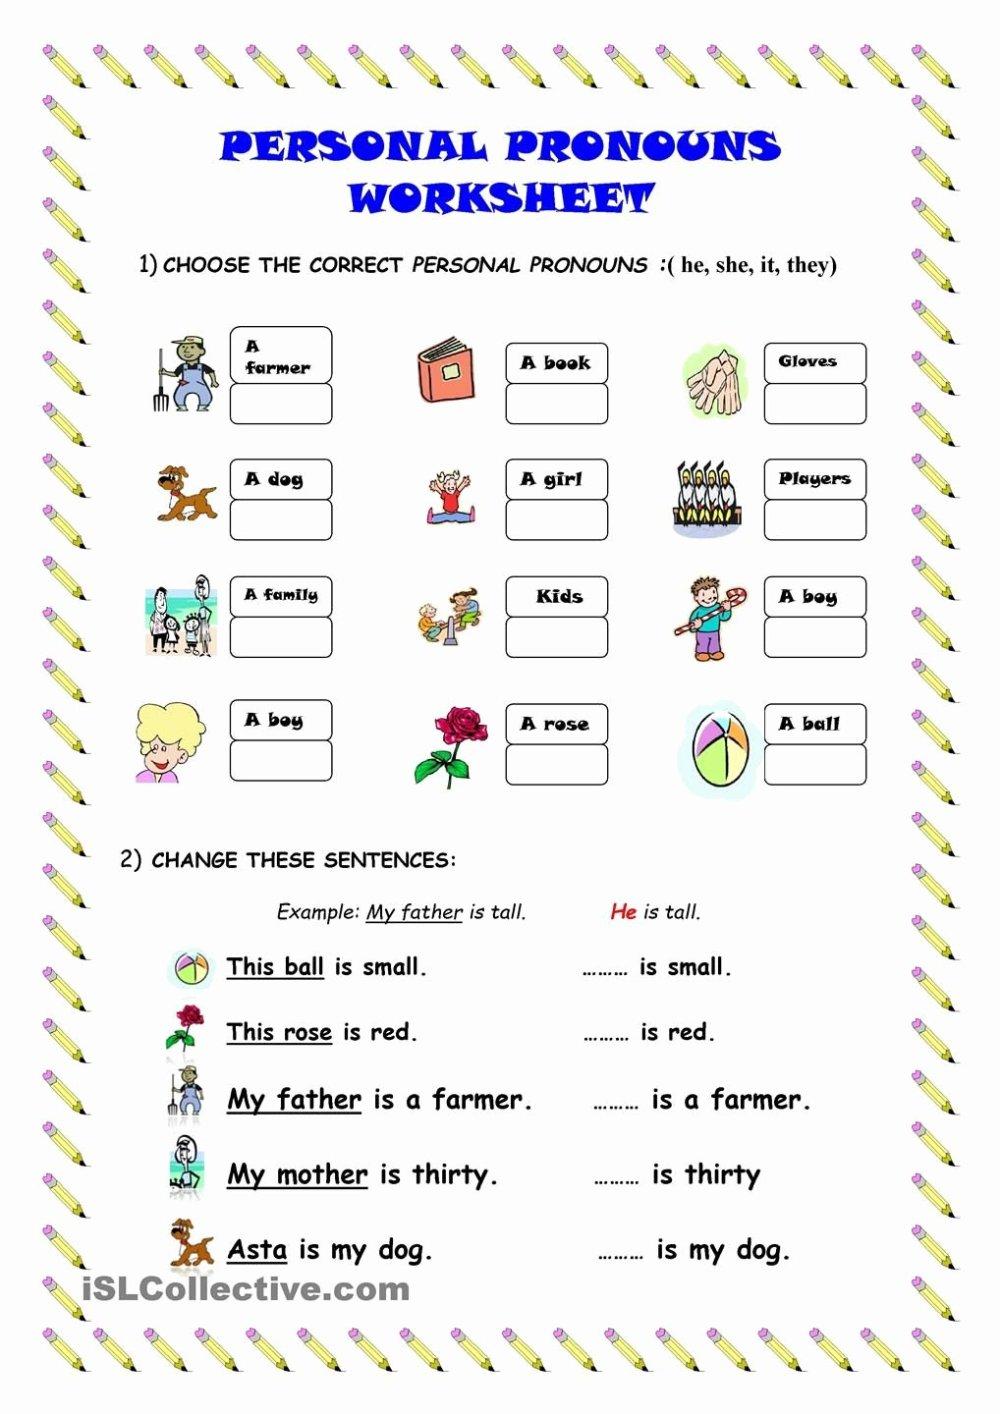 medium resolution of Personal Pronouns Worksheets for Preschoolers Inspirational Possessive  Pronouns His Her Worksheets Worksheet Games to – Printable Worksheets for  Kids